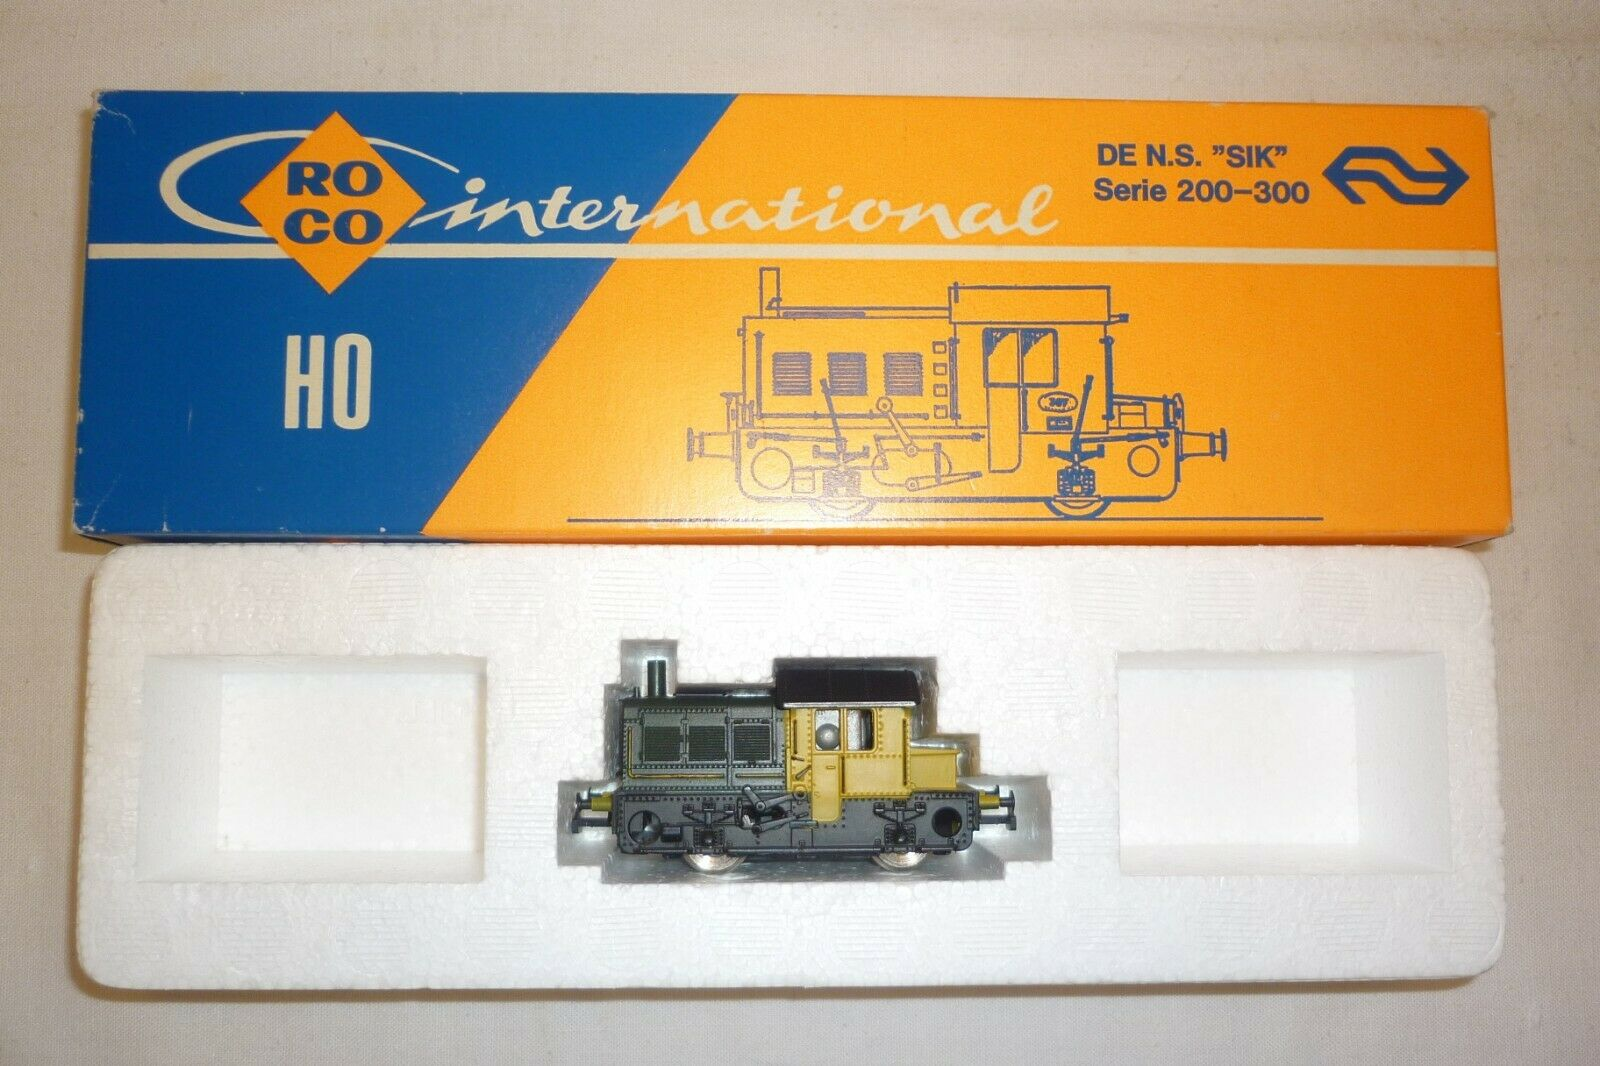 Roco - Échelle H0 - 04153 B Locomotive Diesel de N. S.